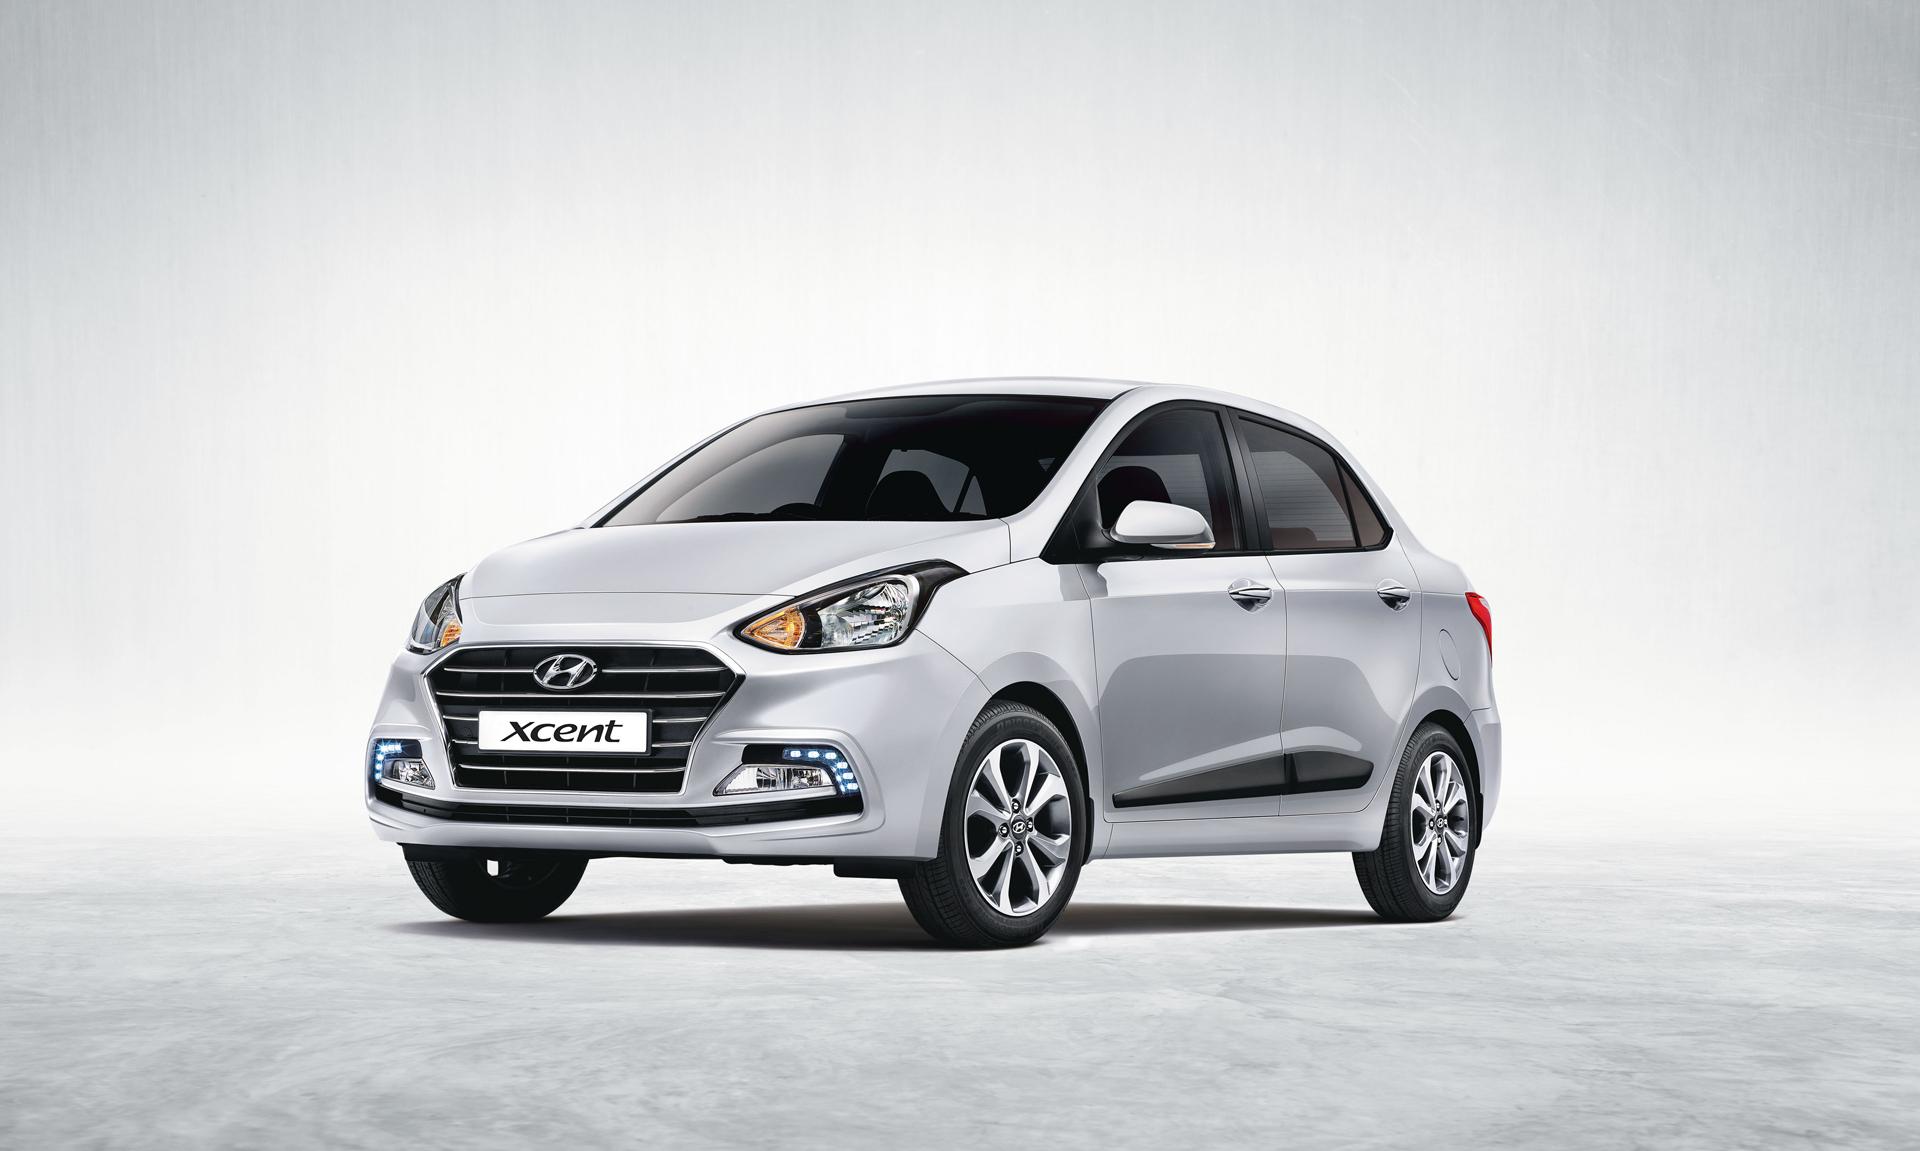 Hyundai Xcent 2017 E Plus Image